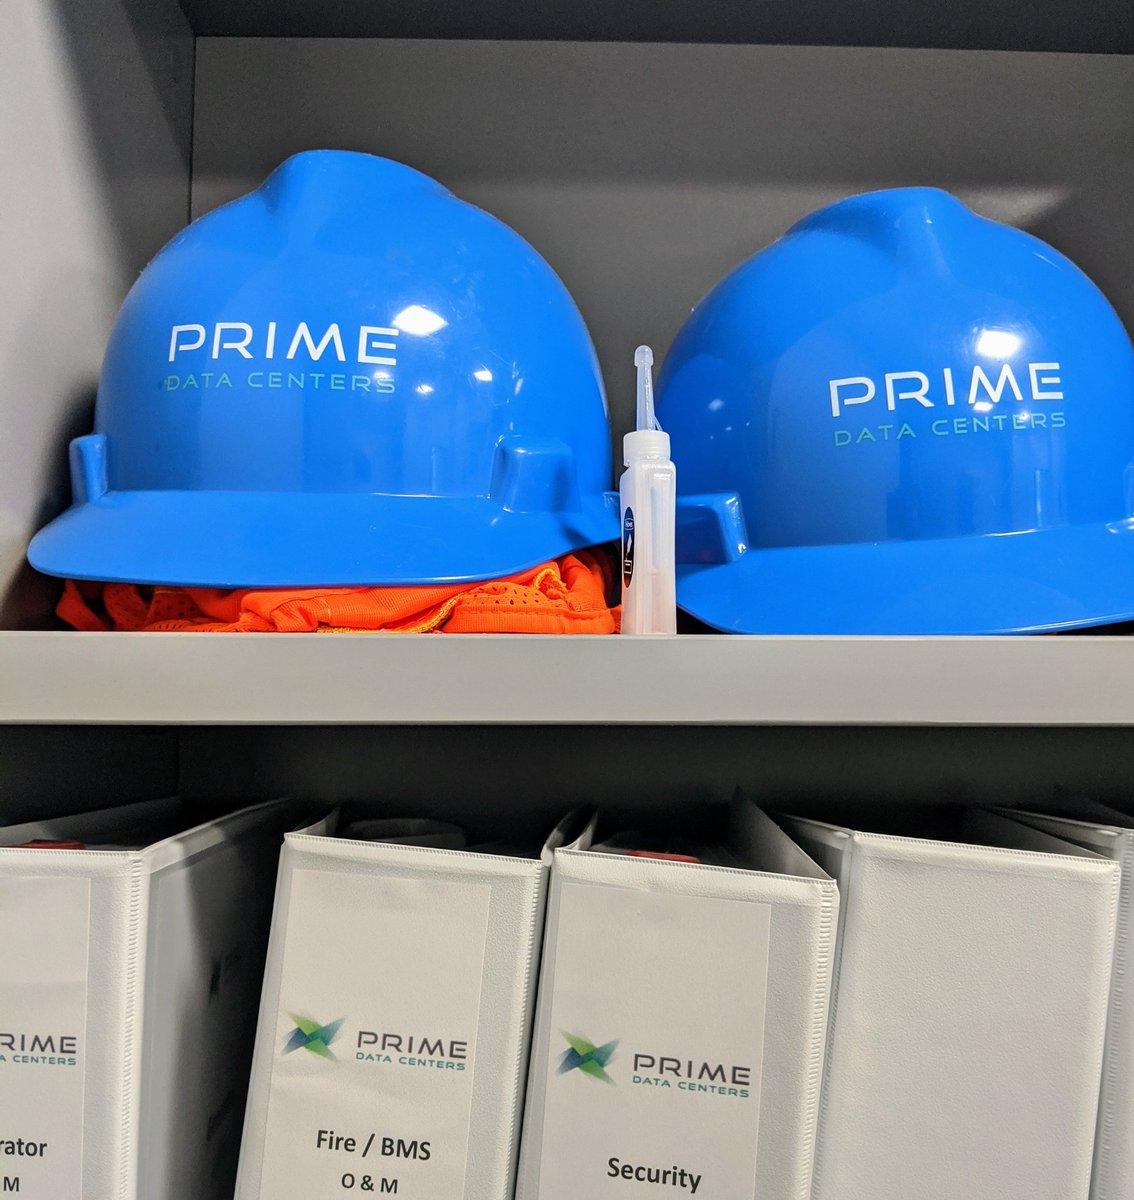 primedatacentrs photo